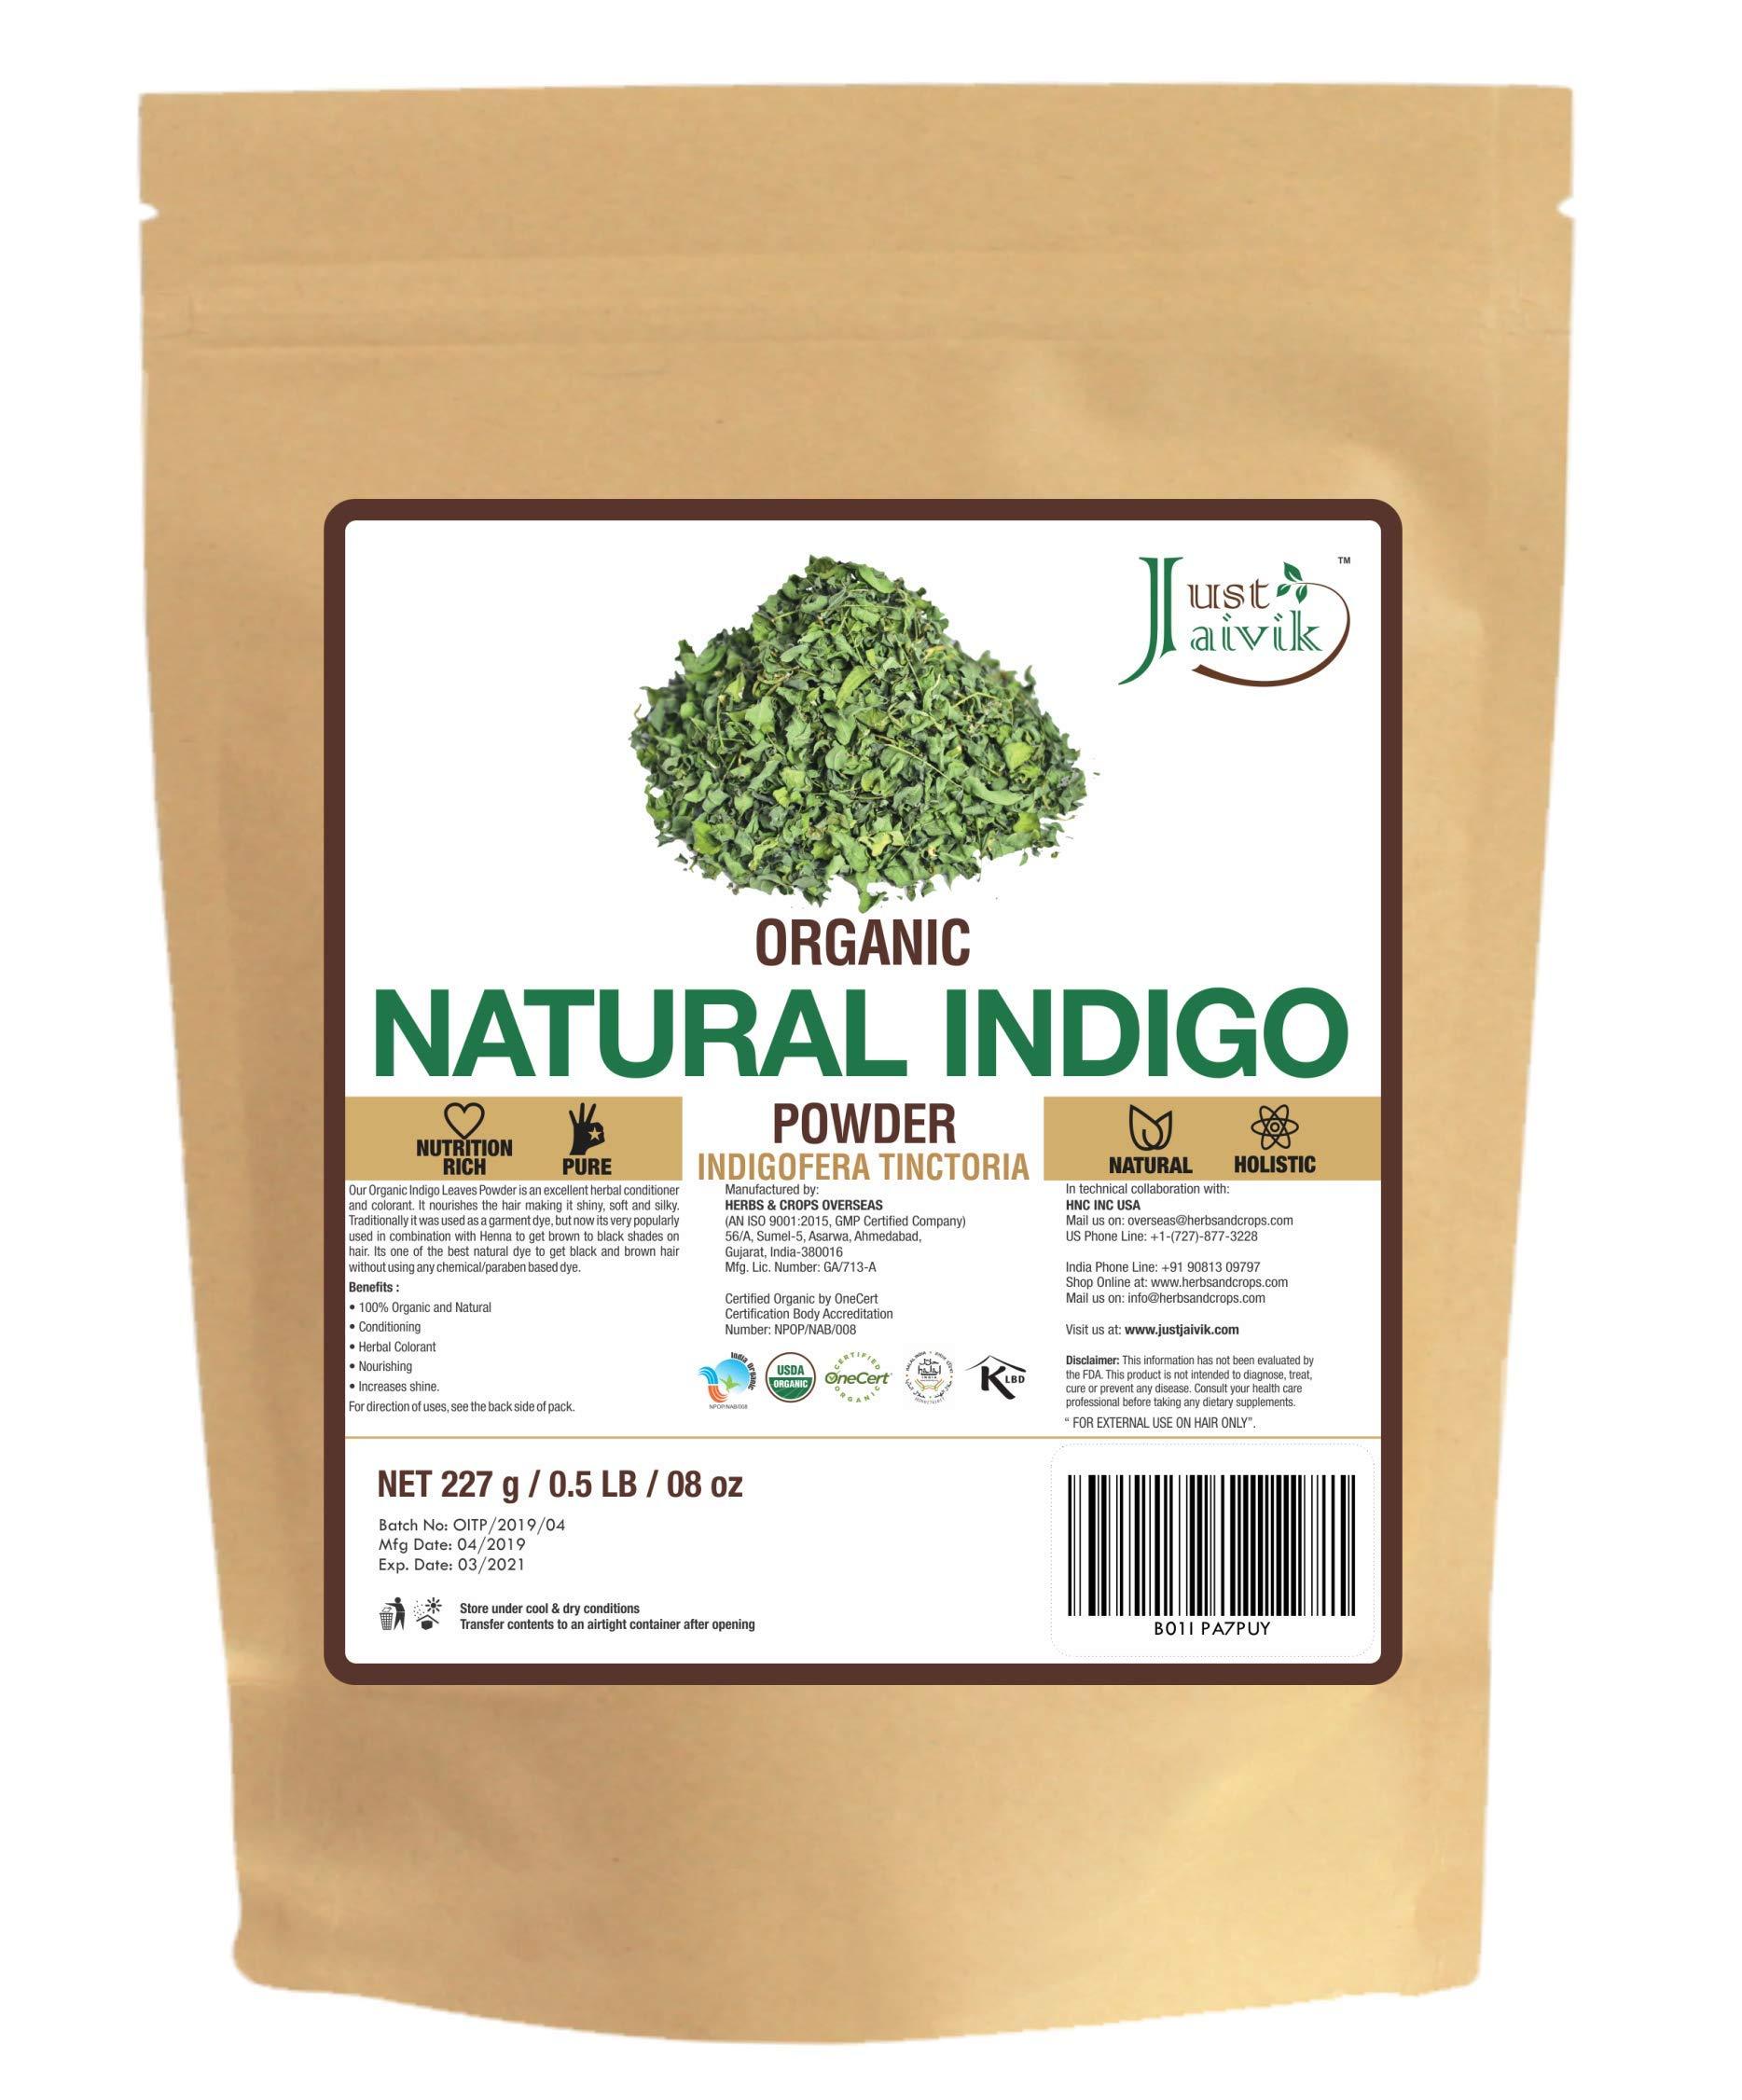 Just Jaivik 100% Organic Indigo Powder - 227 gms / 1/2 LB Pound / 08 Oz - Indigofera Tinctoria- A 100% Organic Hair Dye - Color your hair dark brown to black with Henna by Just Jaivik